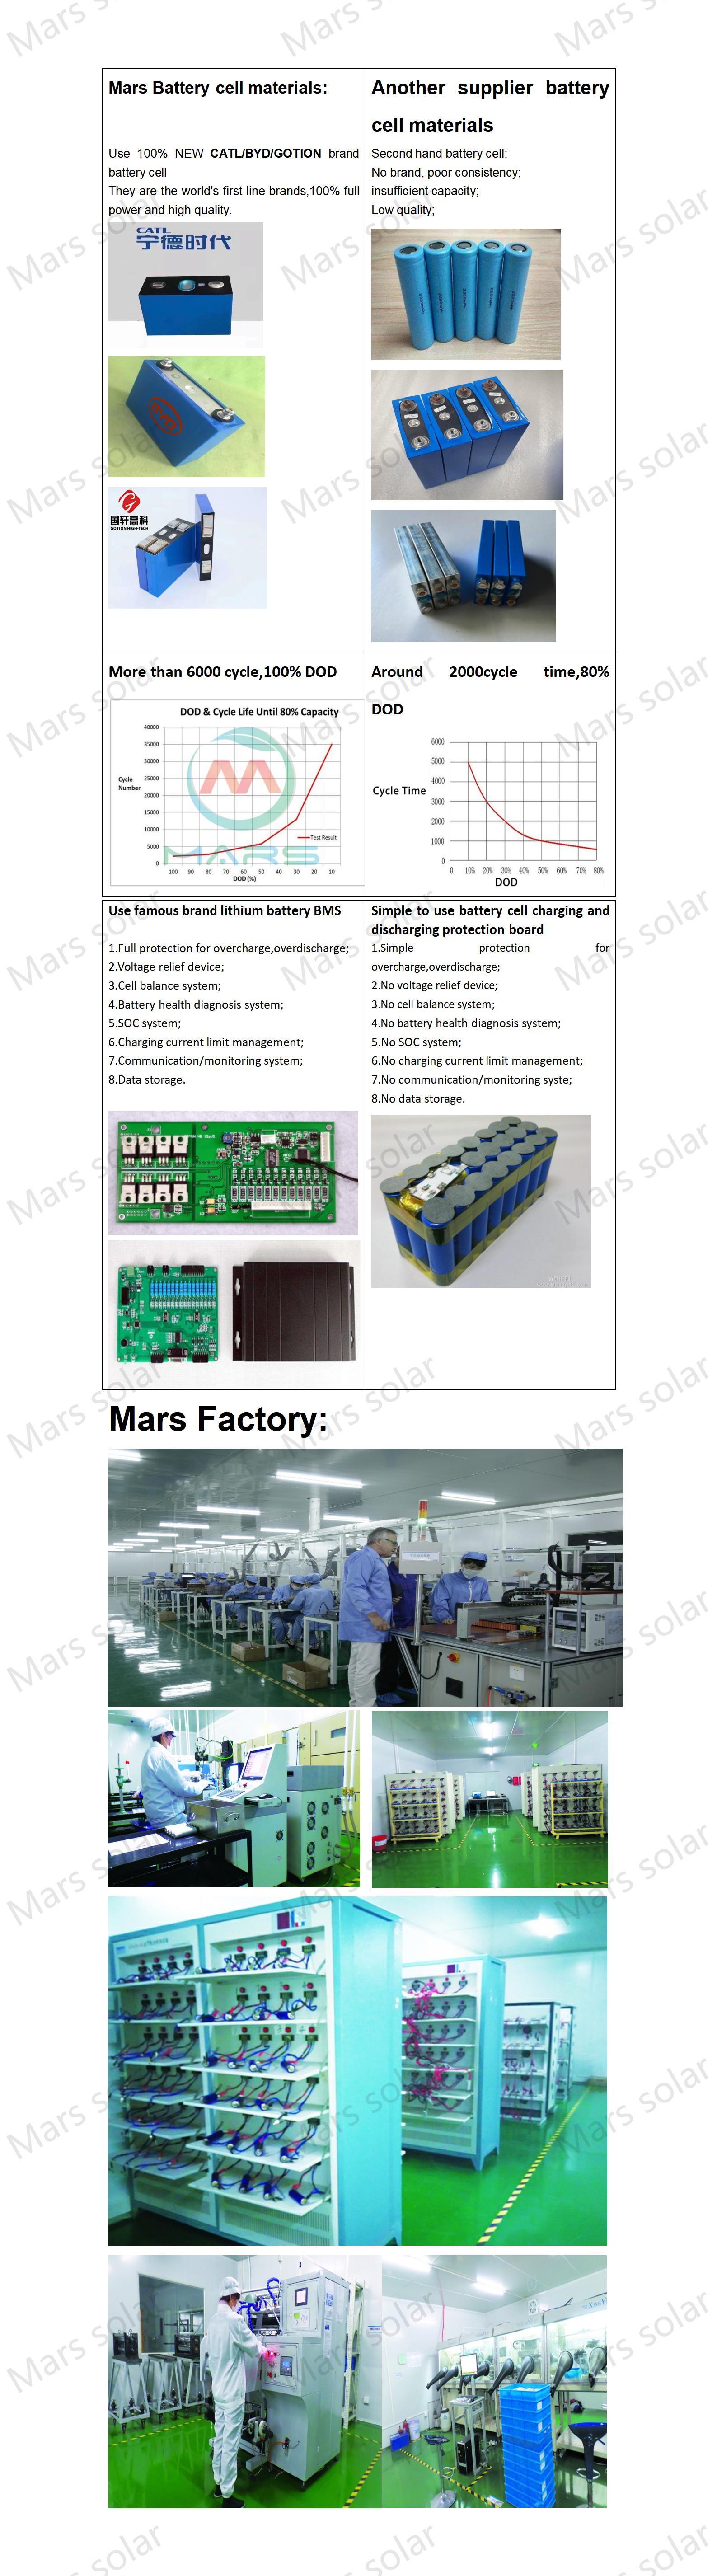 lithium battery for solar energy storage